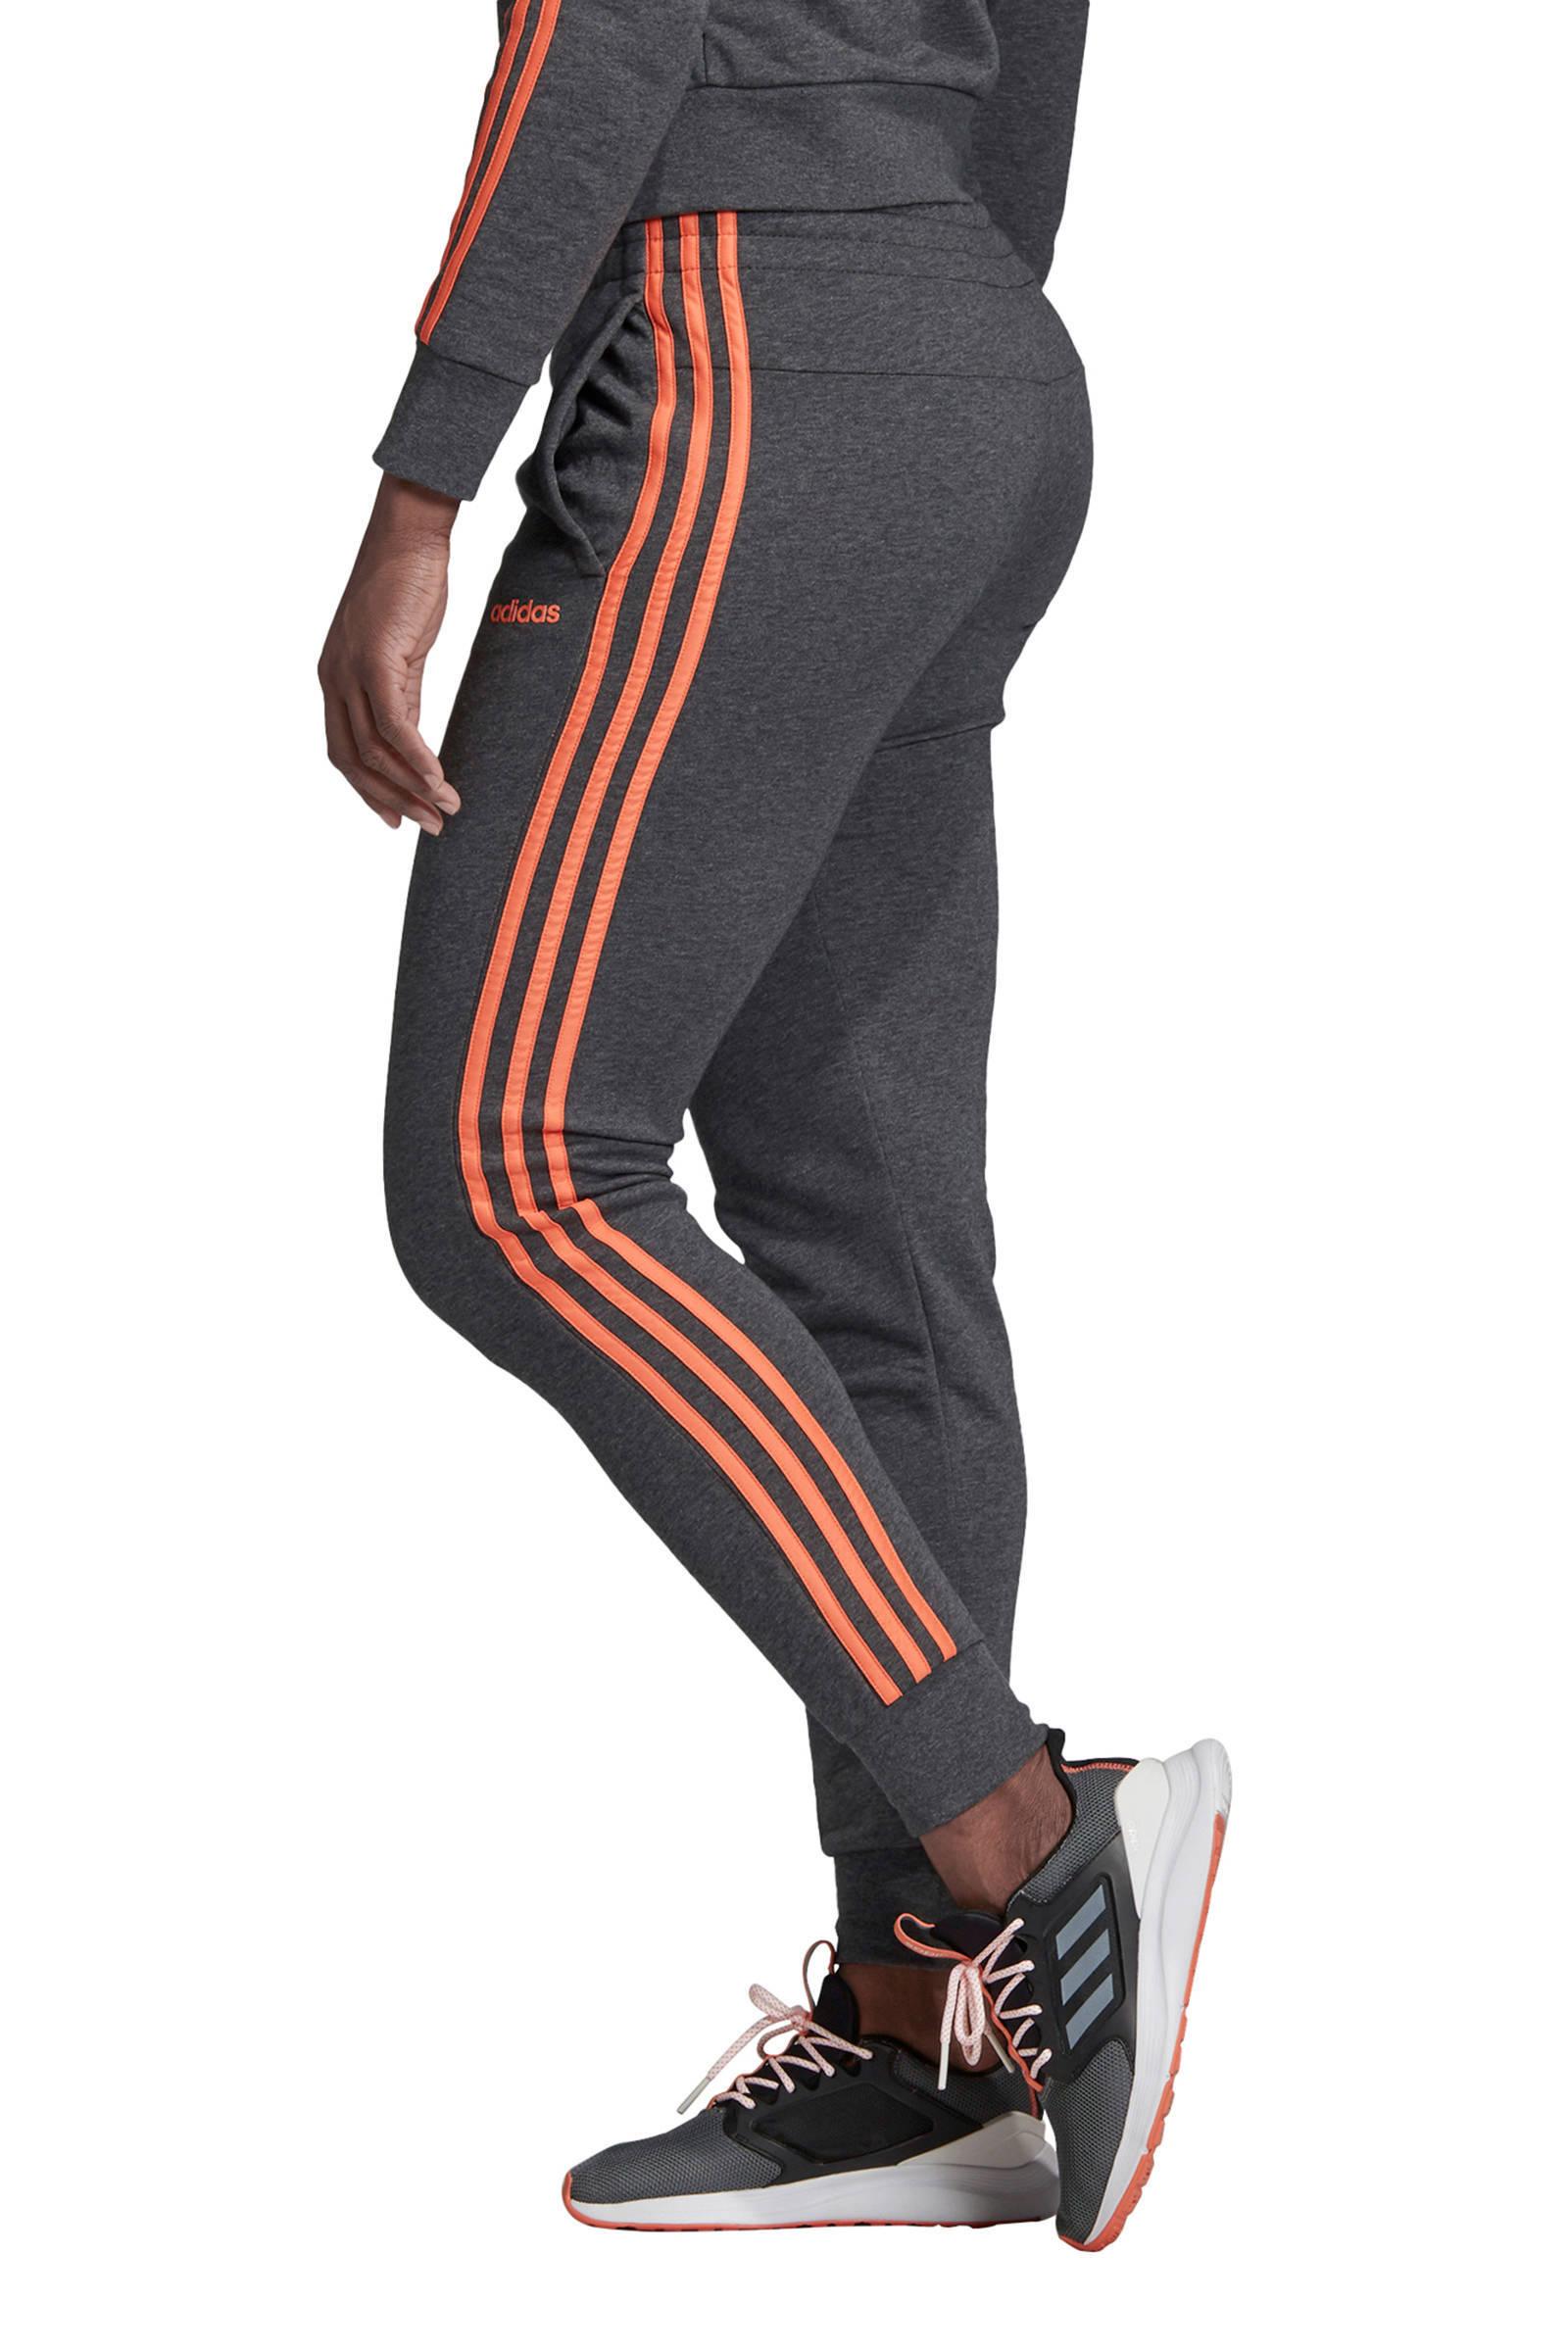 adidas Performance joggingbroek grijs/oranje | wehkamp